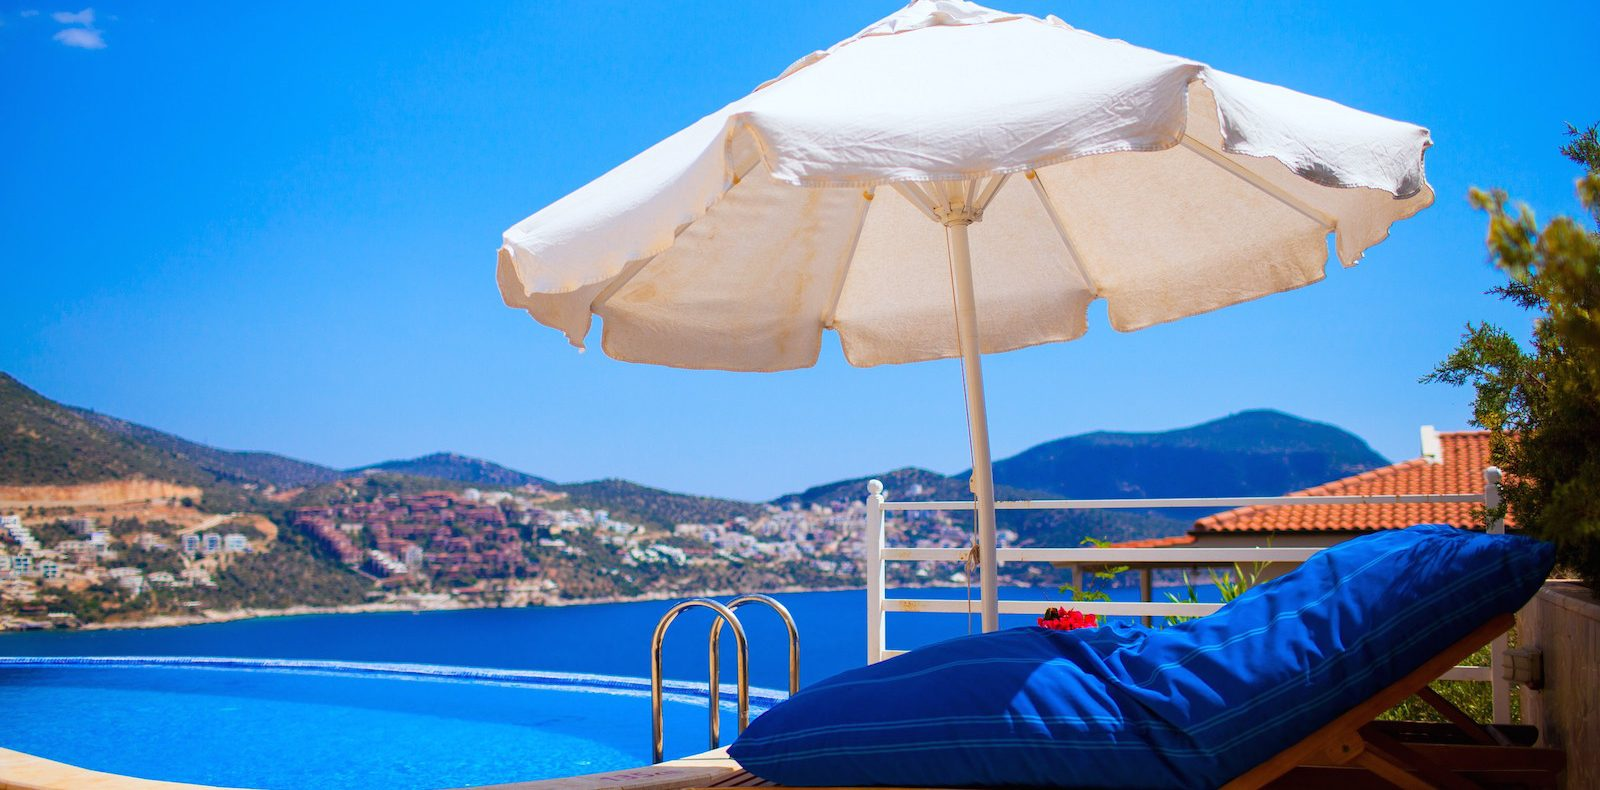 Three Bedroom Luxury Villa For Rent in Kalkan, Turkey